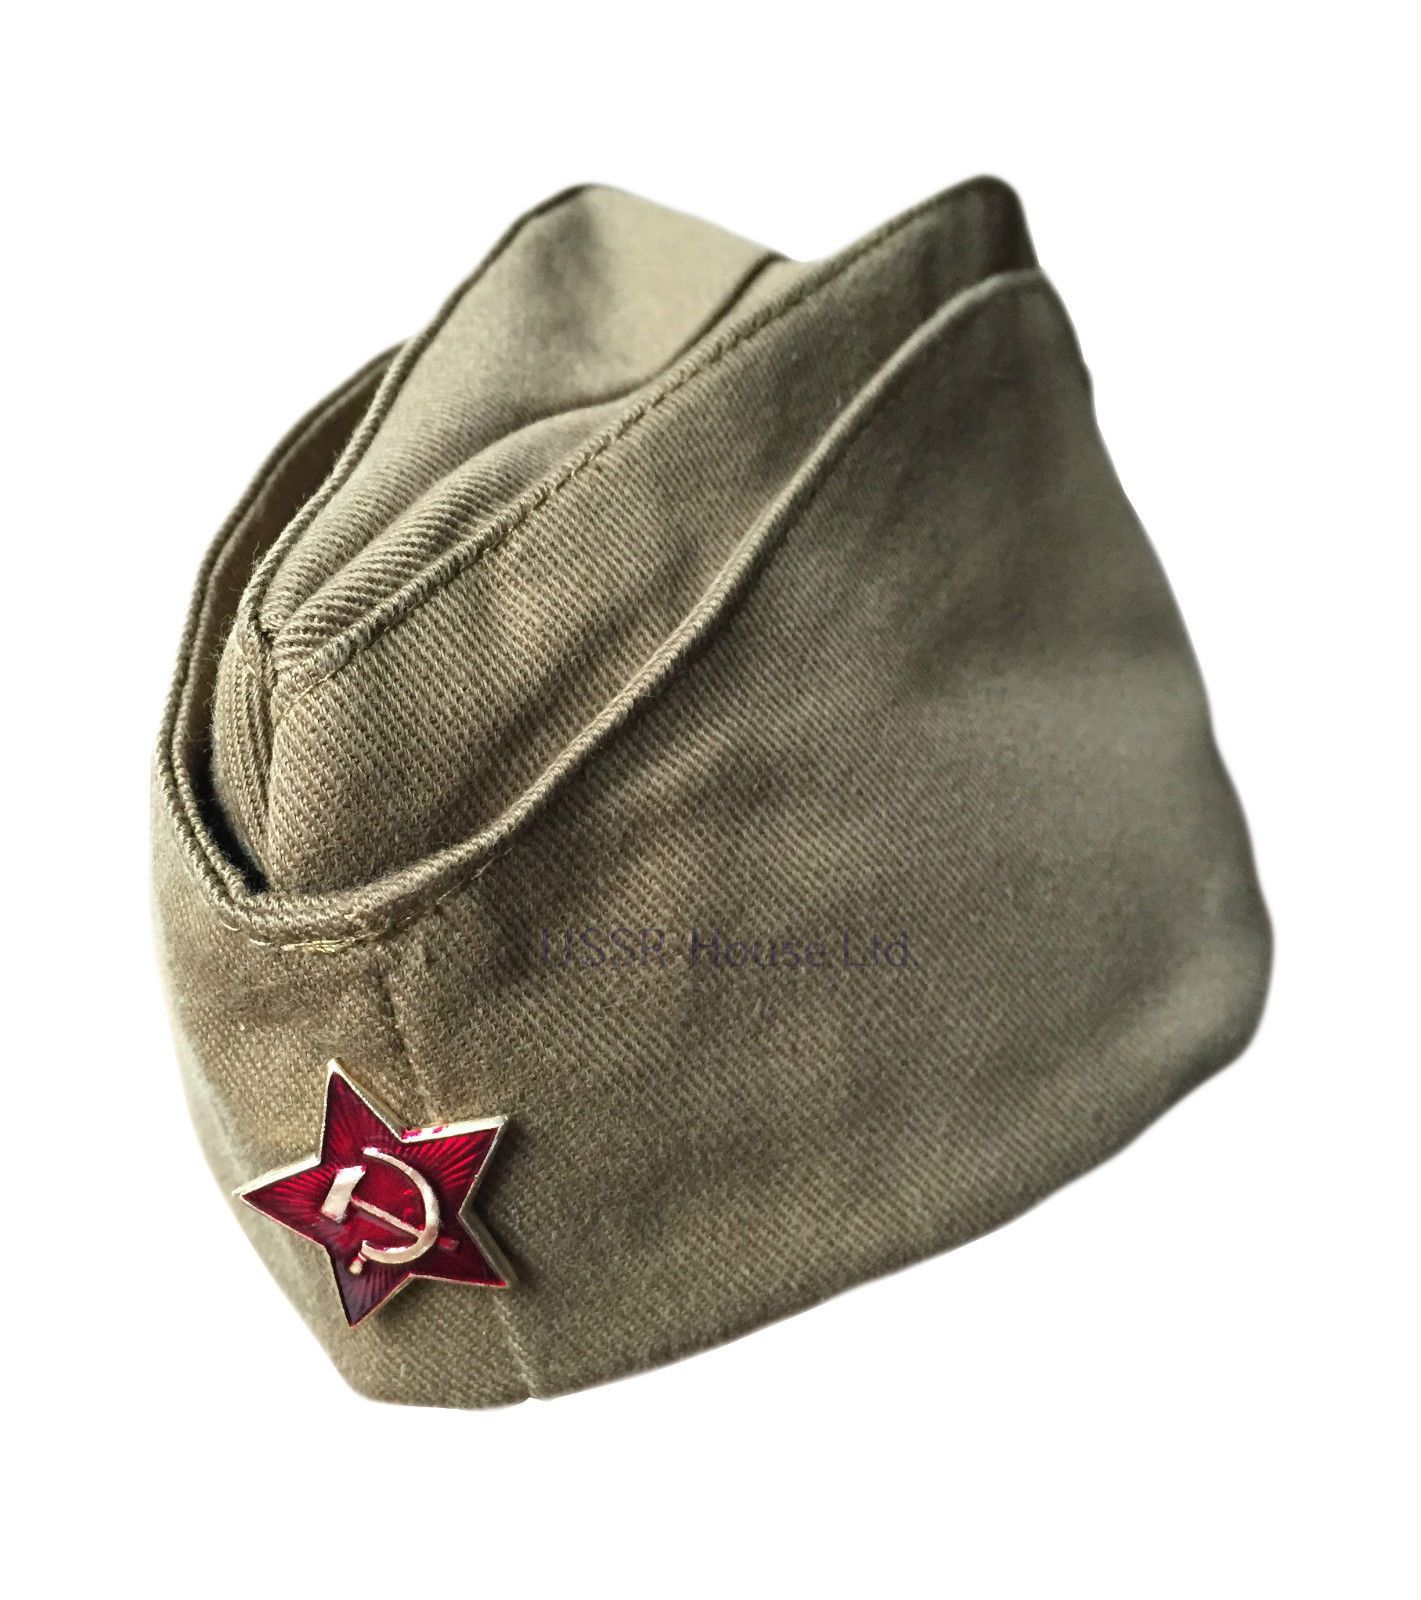 86d88a97a23 Genuine Russian Soviet USSR Red Army WW2 Military Uniform Pilotka Hat Cap  Badge